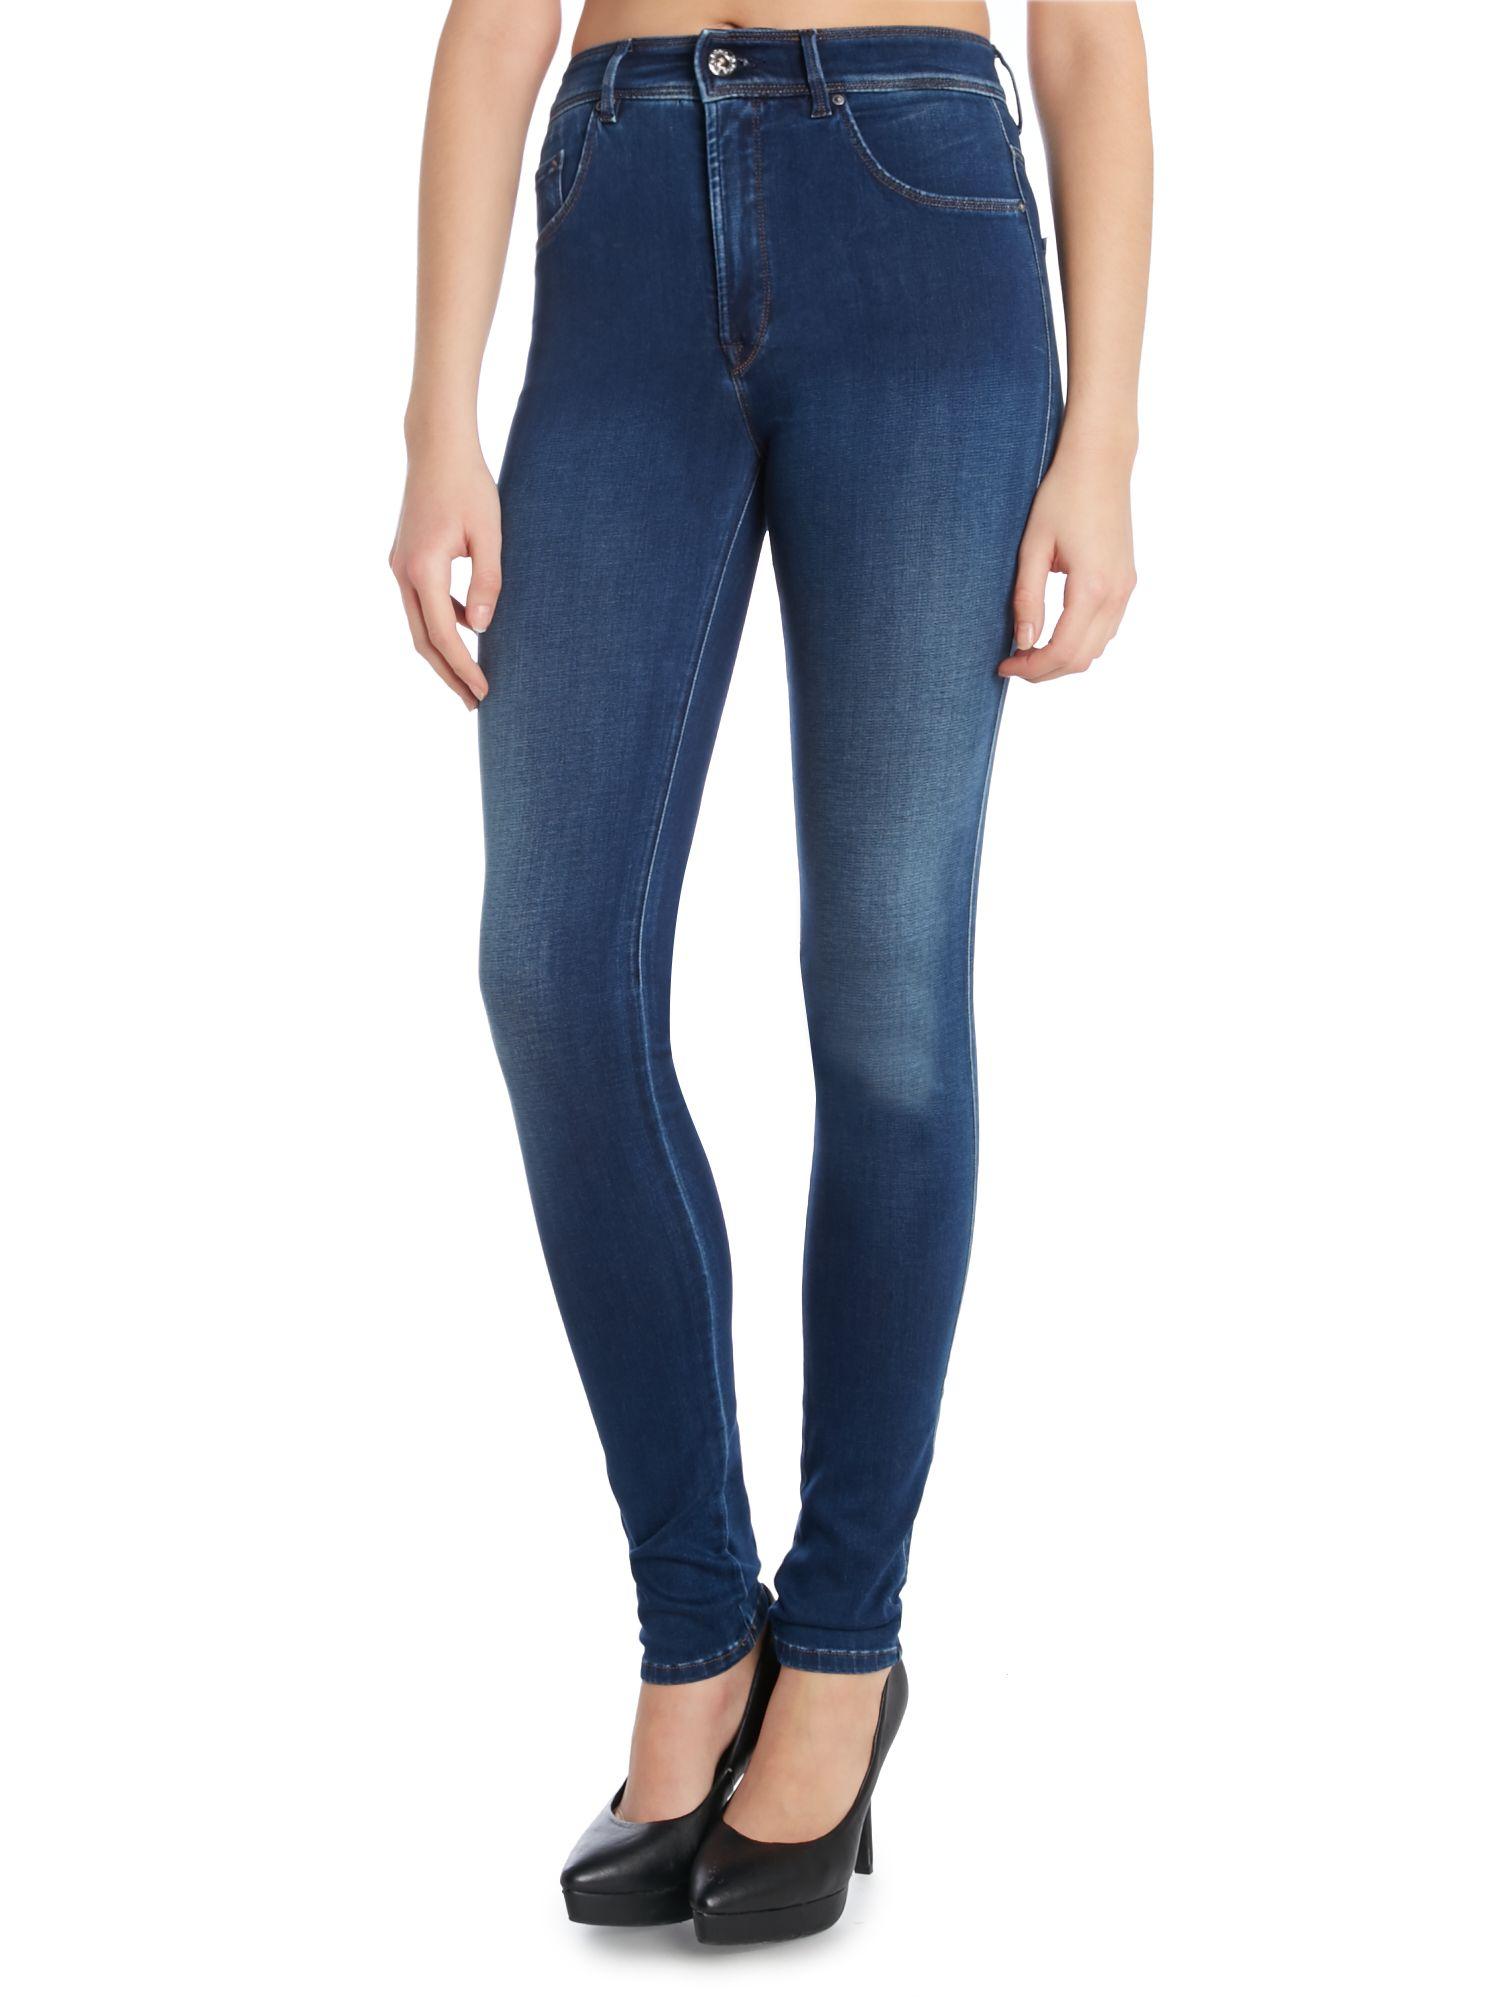 lyst salsa high waist skinny carrie jean in mid wash in blue. Black Bedroom Furniture Sets. Home Design Ideas